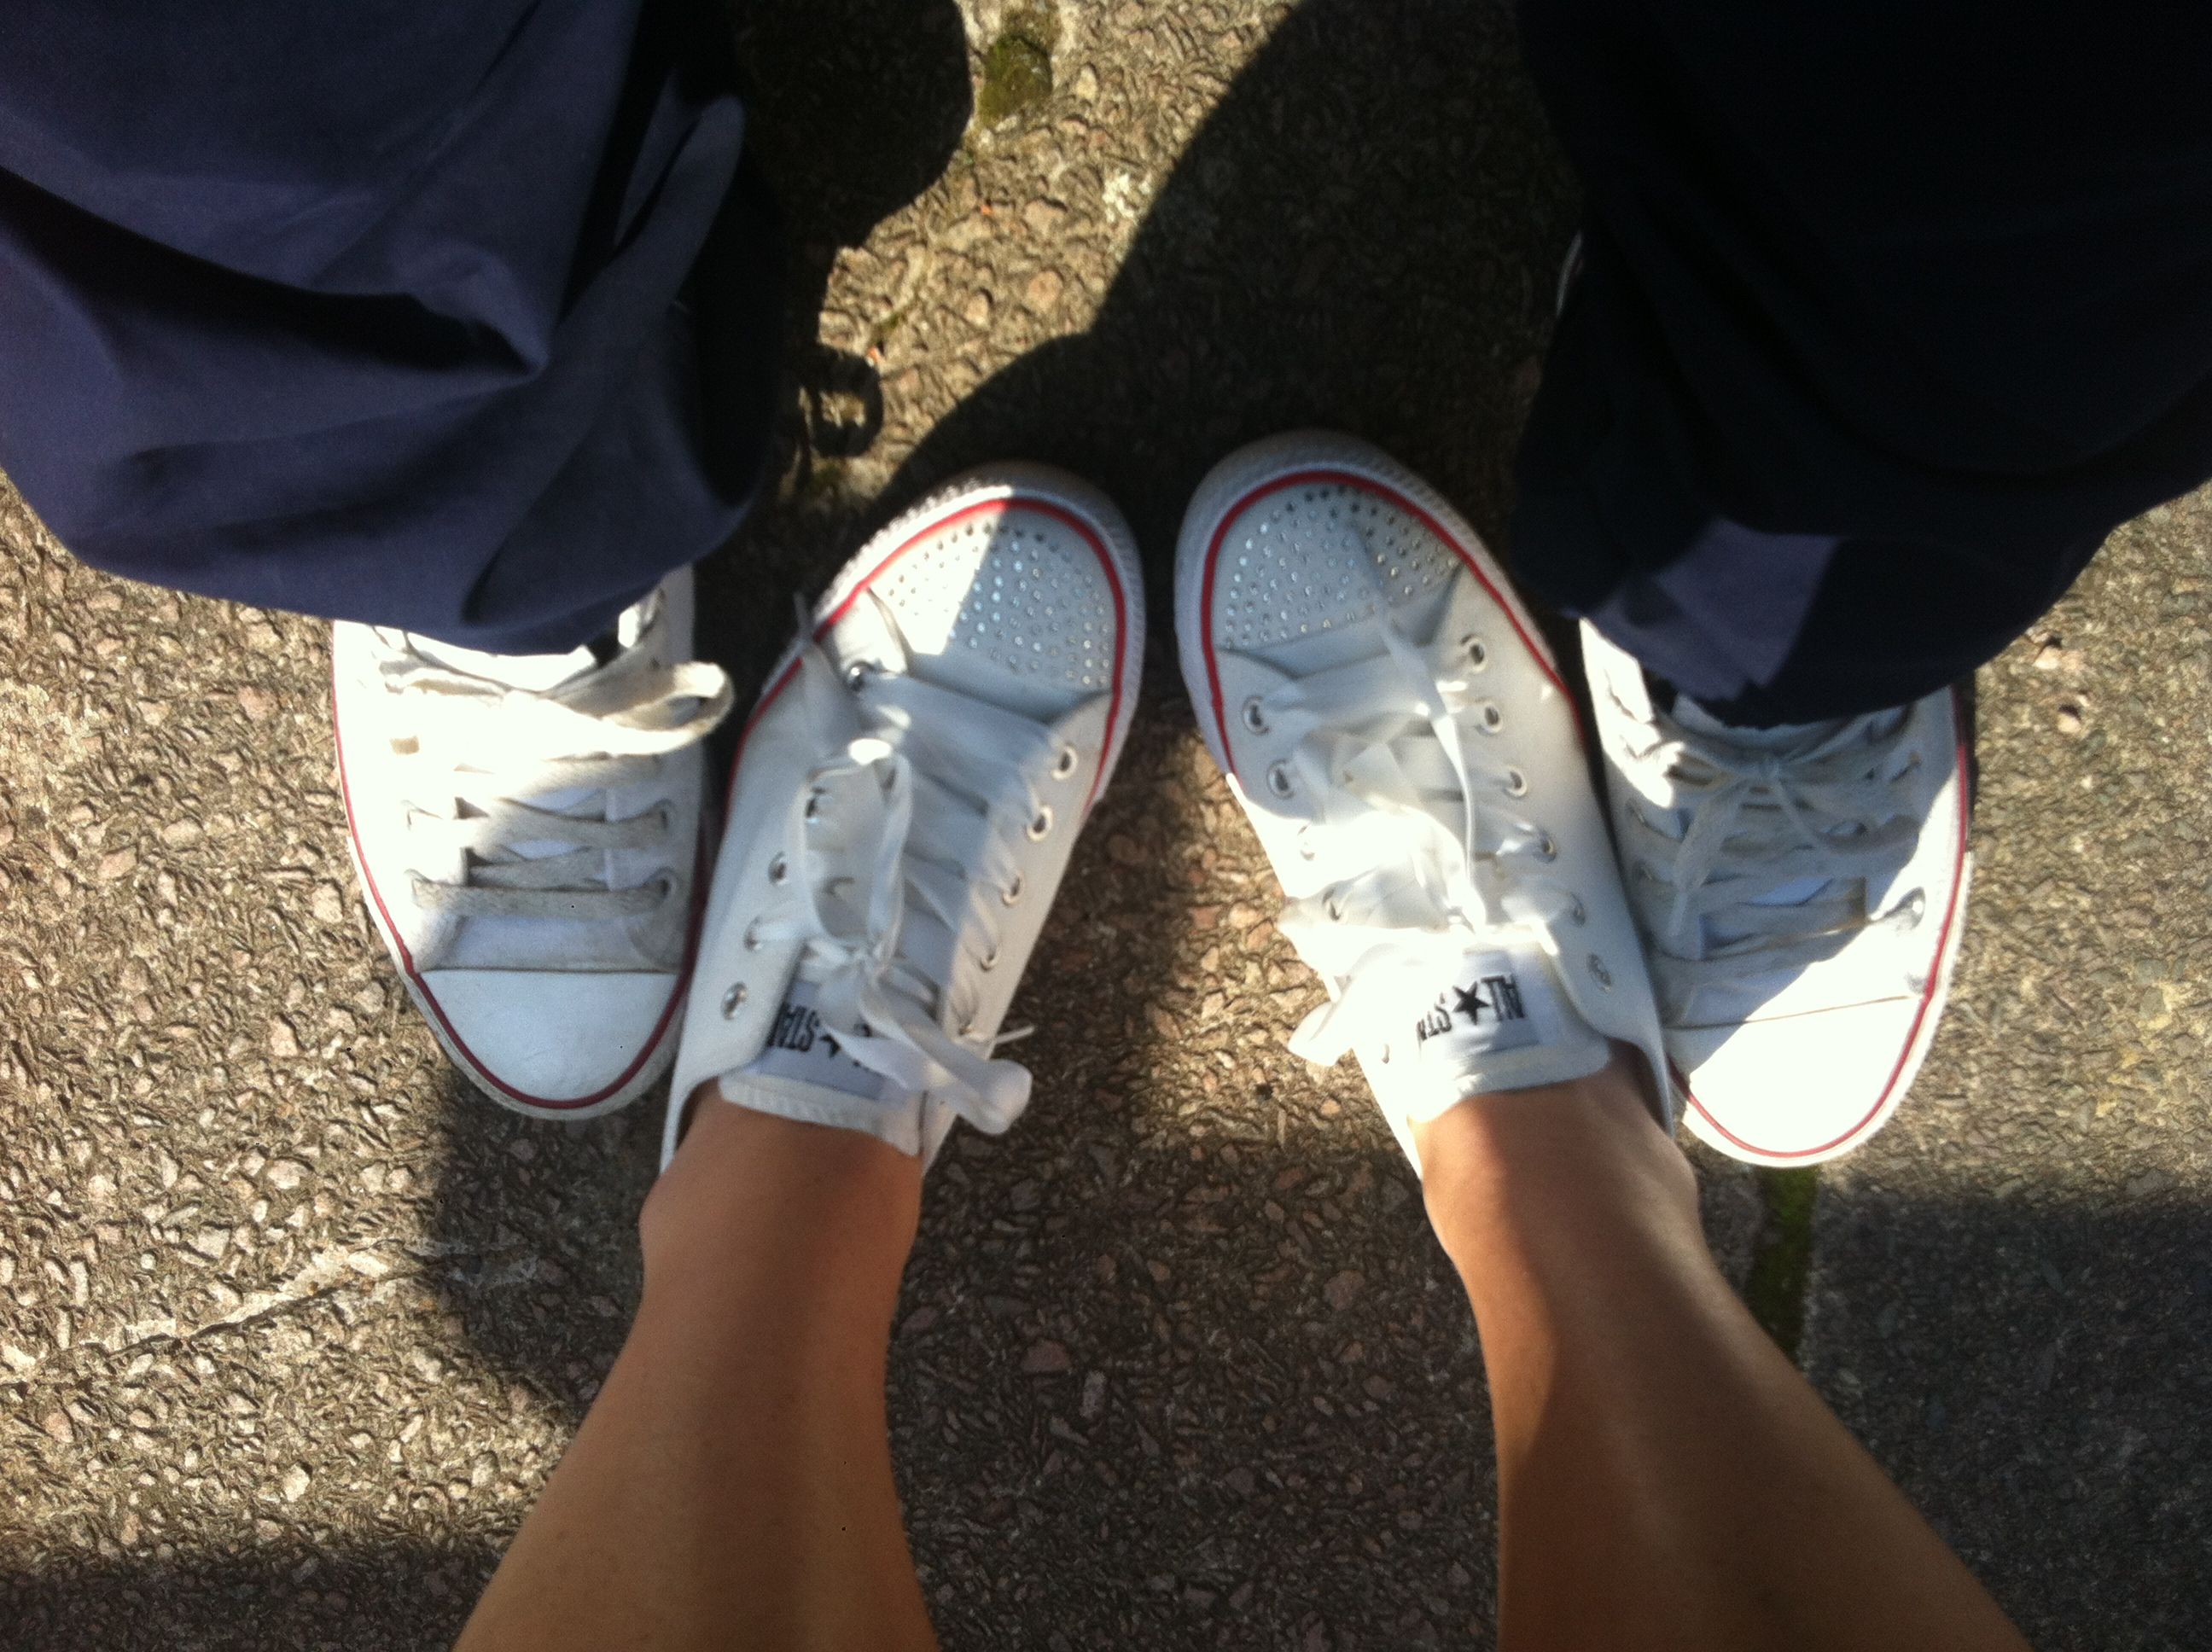 b42dcce90adc Converse.. Girlfriend n boyfriend matching converse